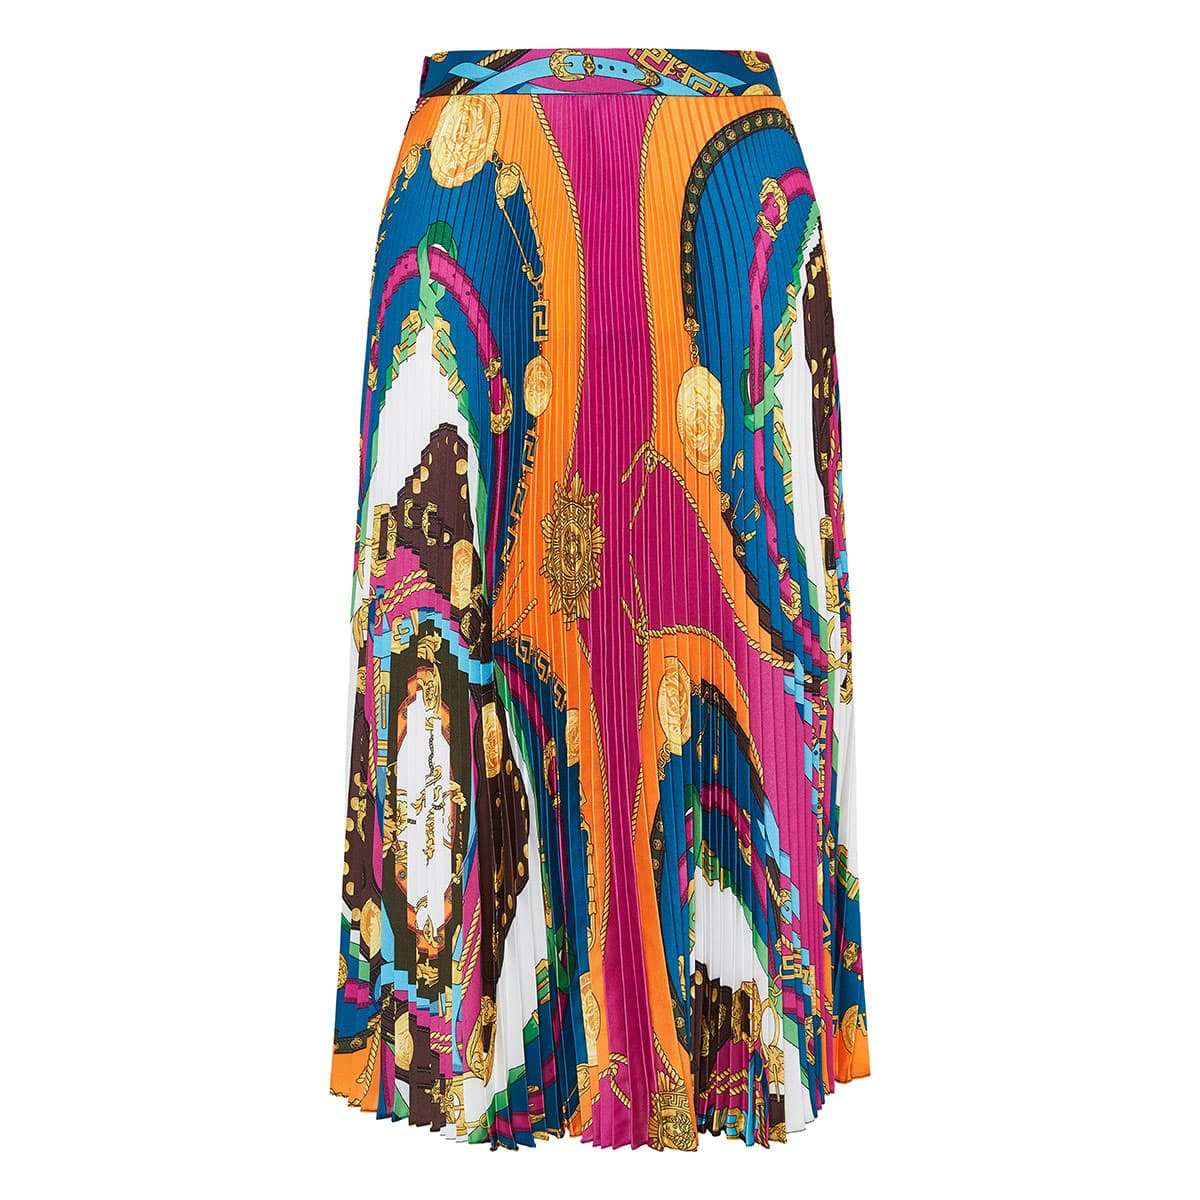 Barocco Rodeo pleated midi skirt